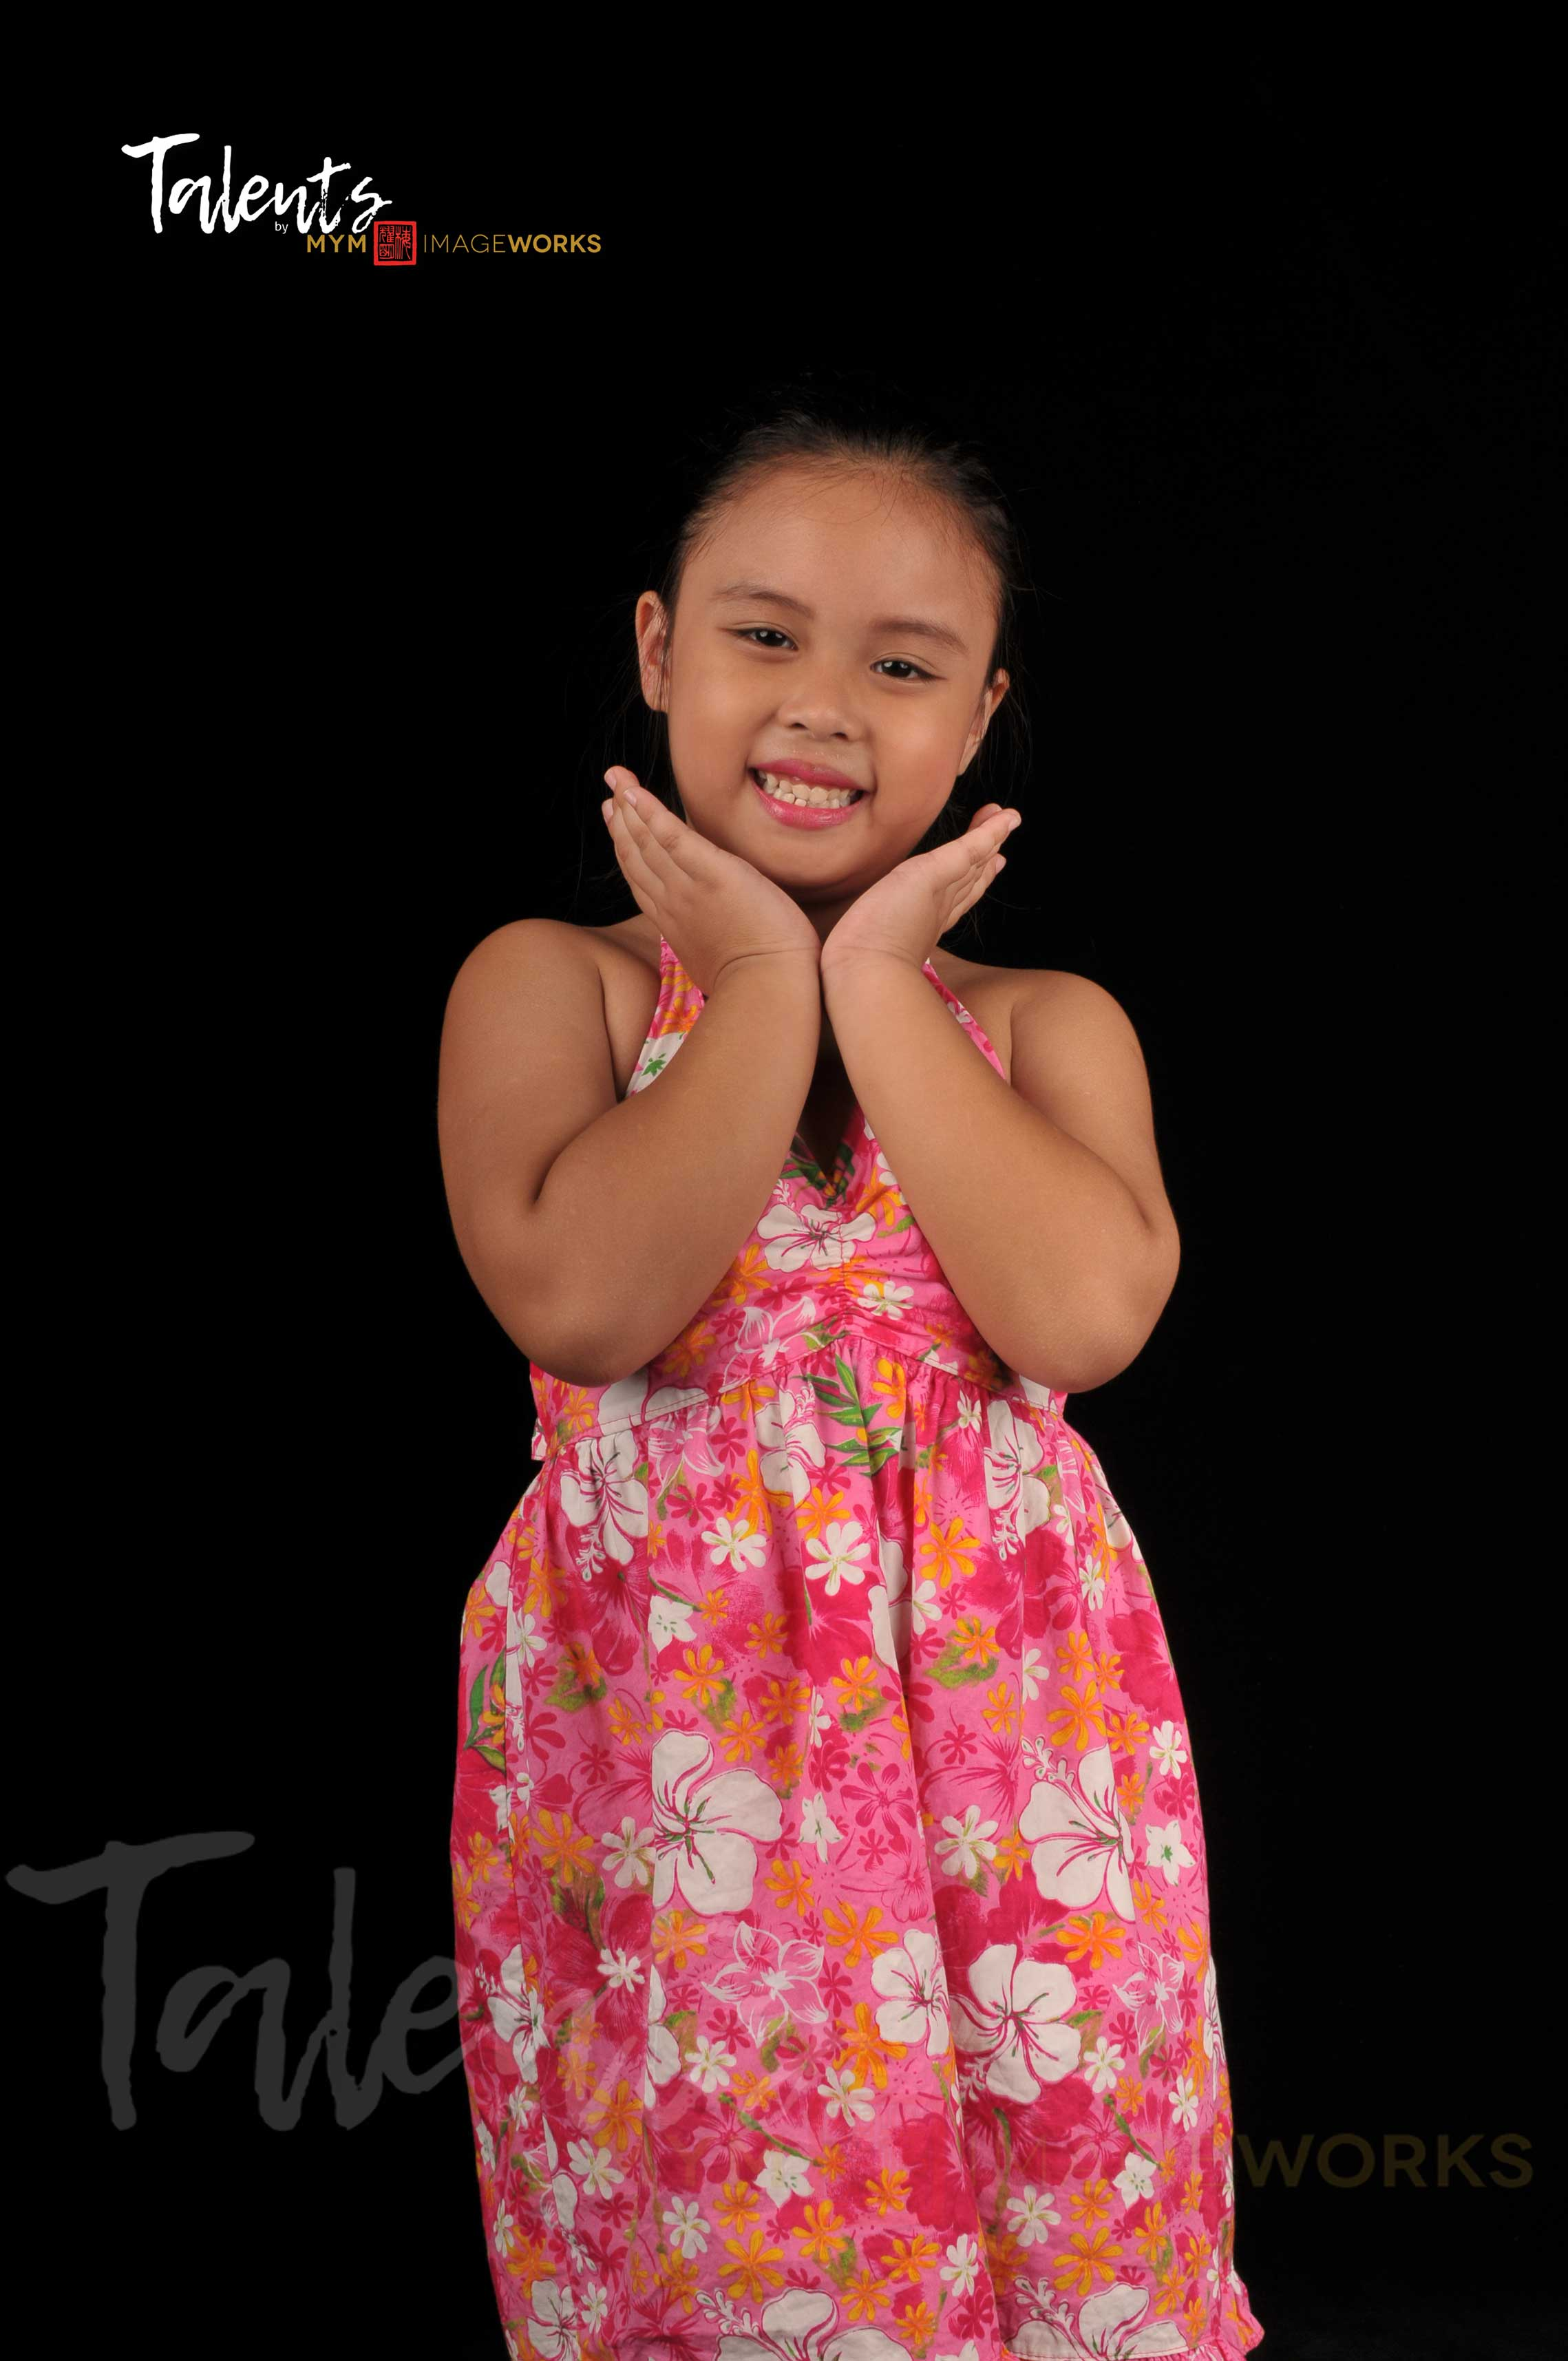 MYM-imageworks-talents-Valetlycia-1